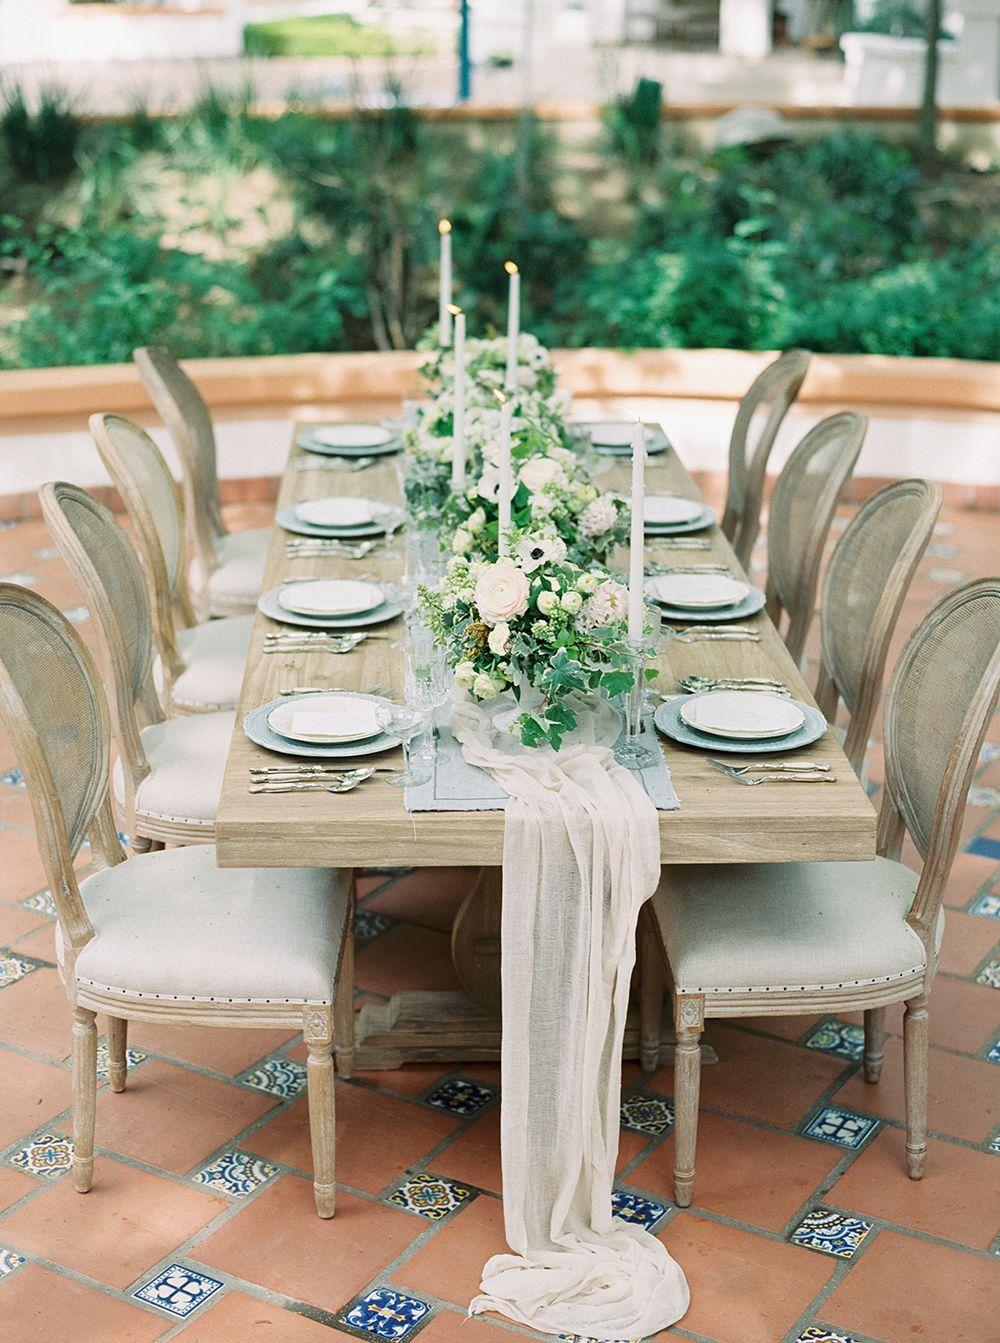 Whimsical Wedding Photography: Fresh And Whimsical Wedding Ideas By Lunda De Mare